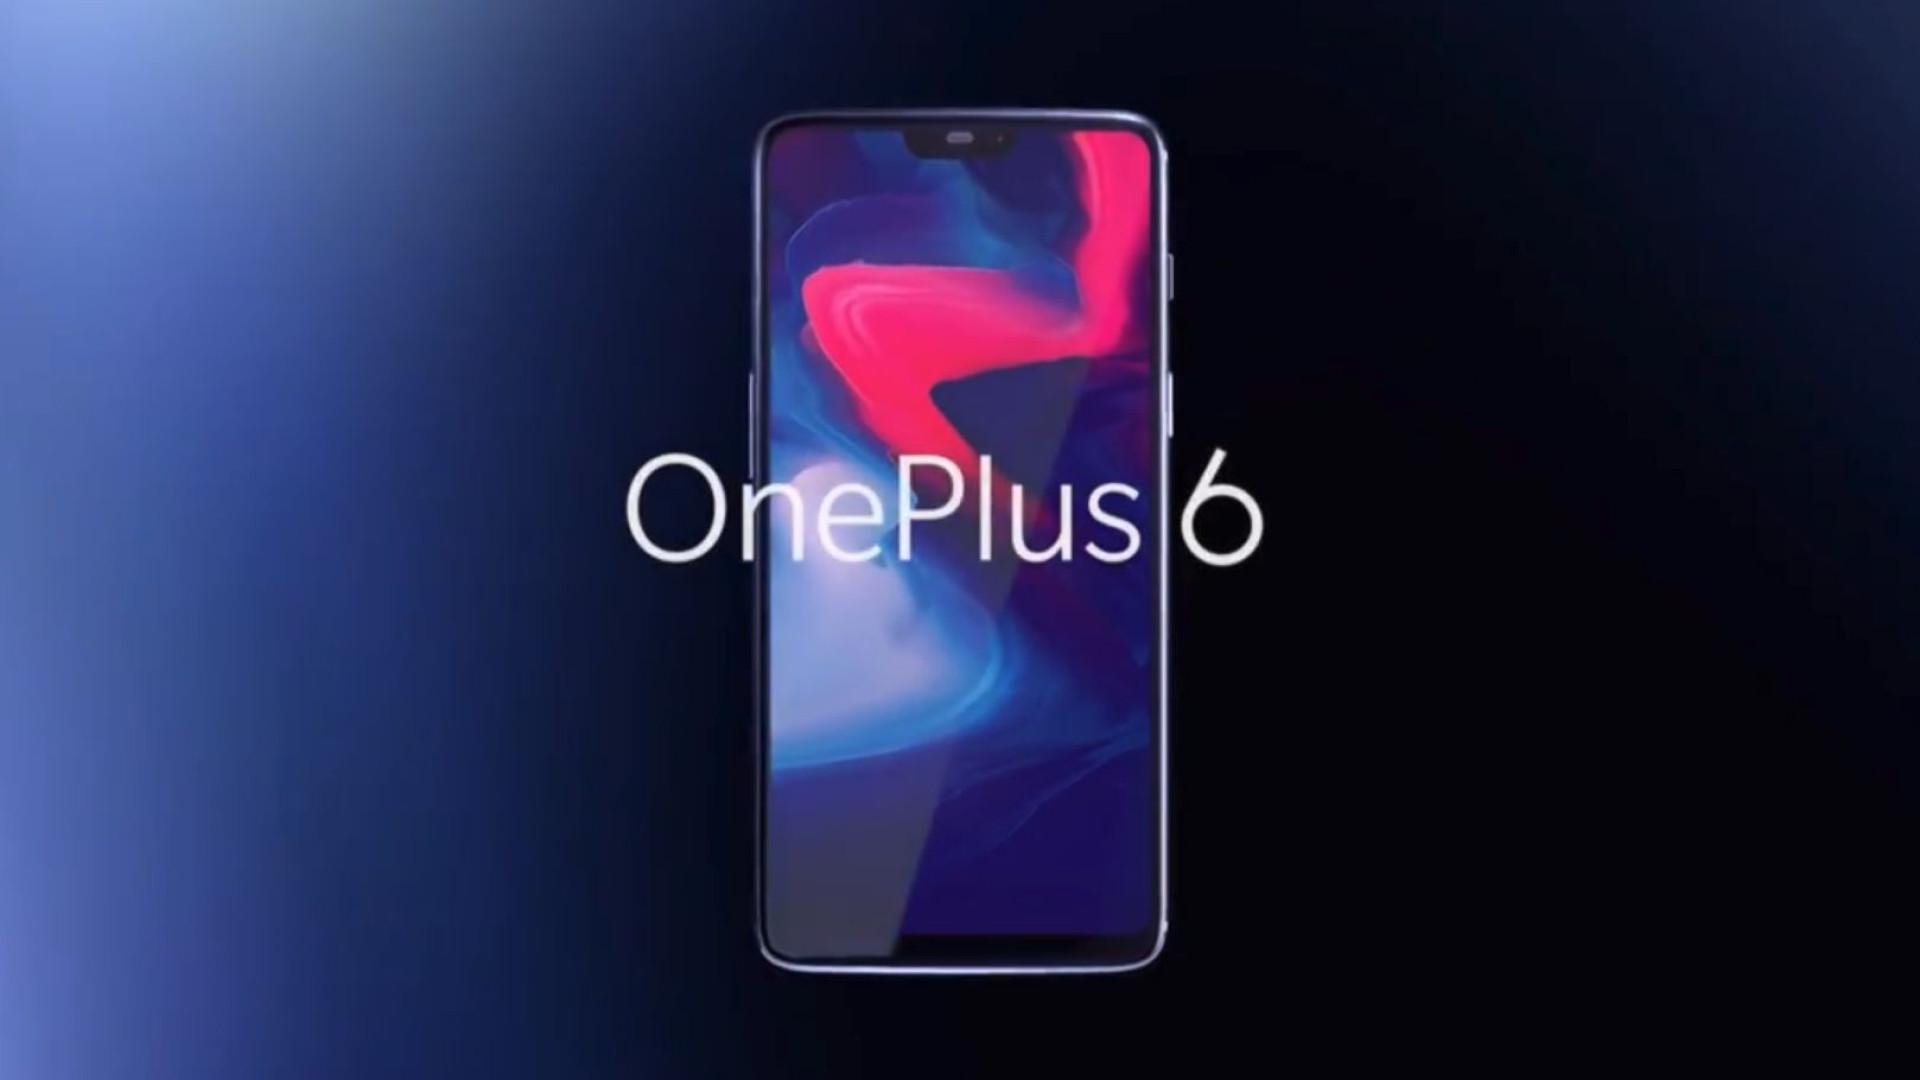 Eis o OnePlus 6, a proposta da marca chinesa para 2018